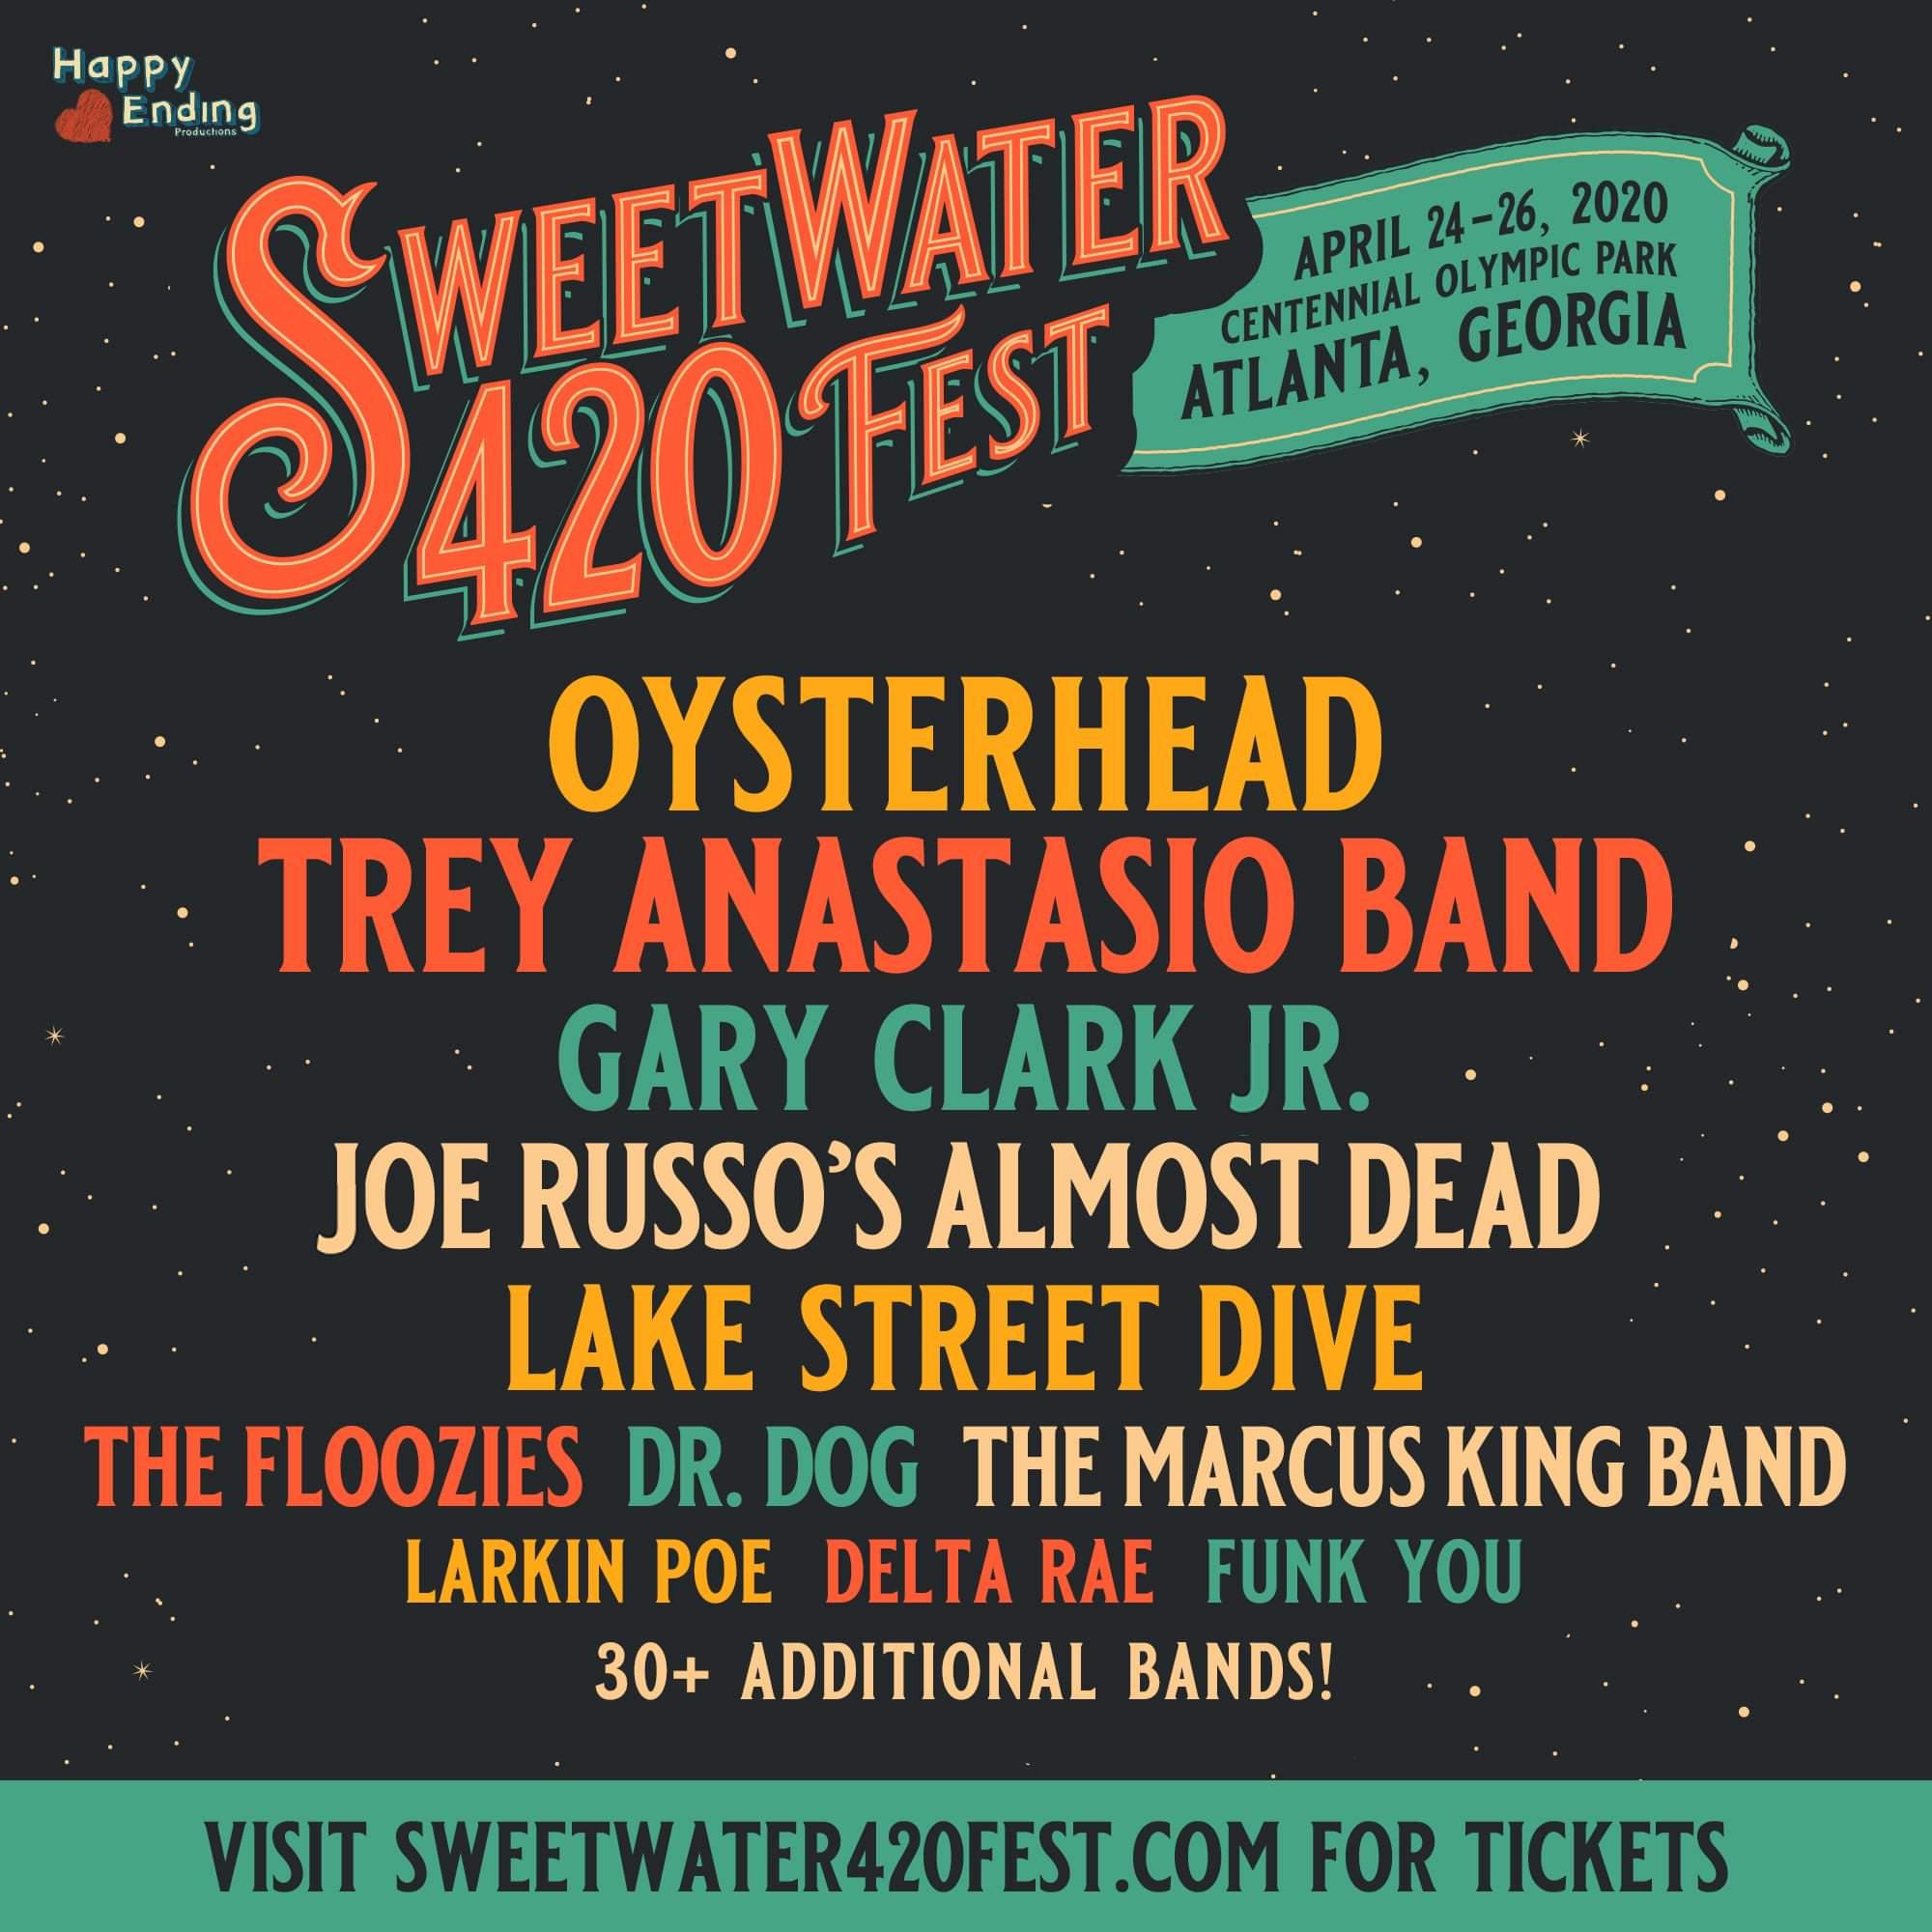 Sweetwater Fest 420 2020